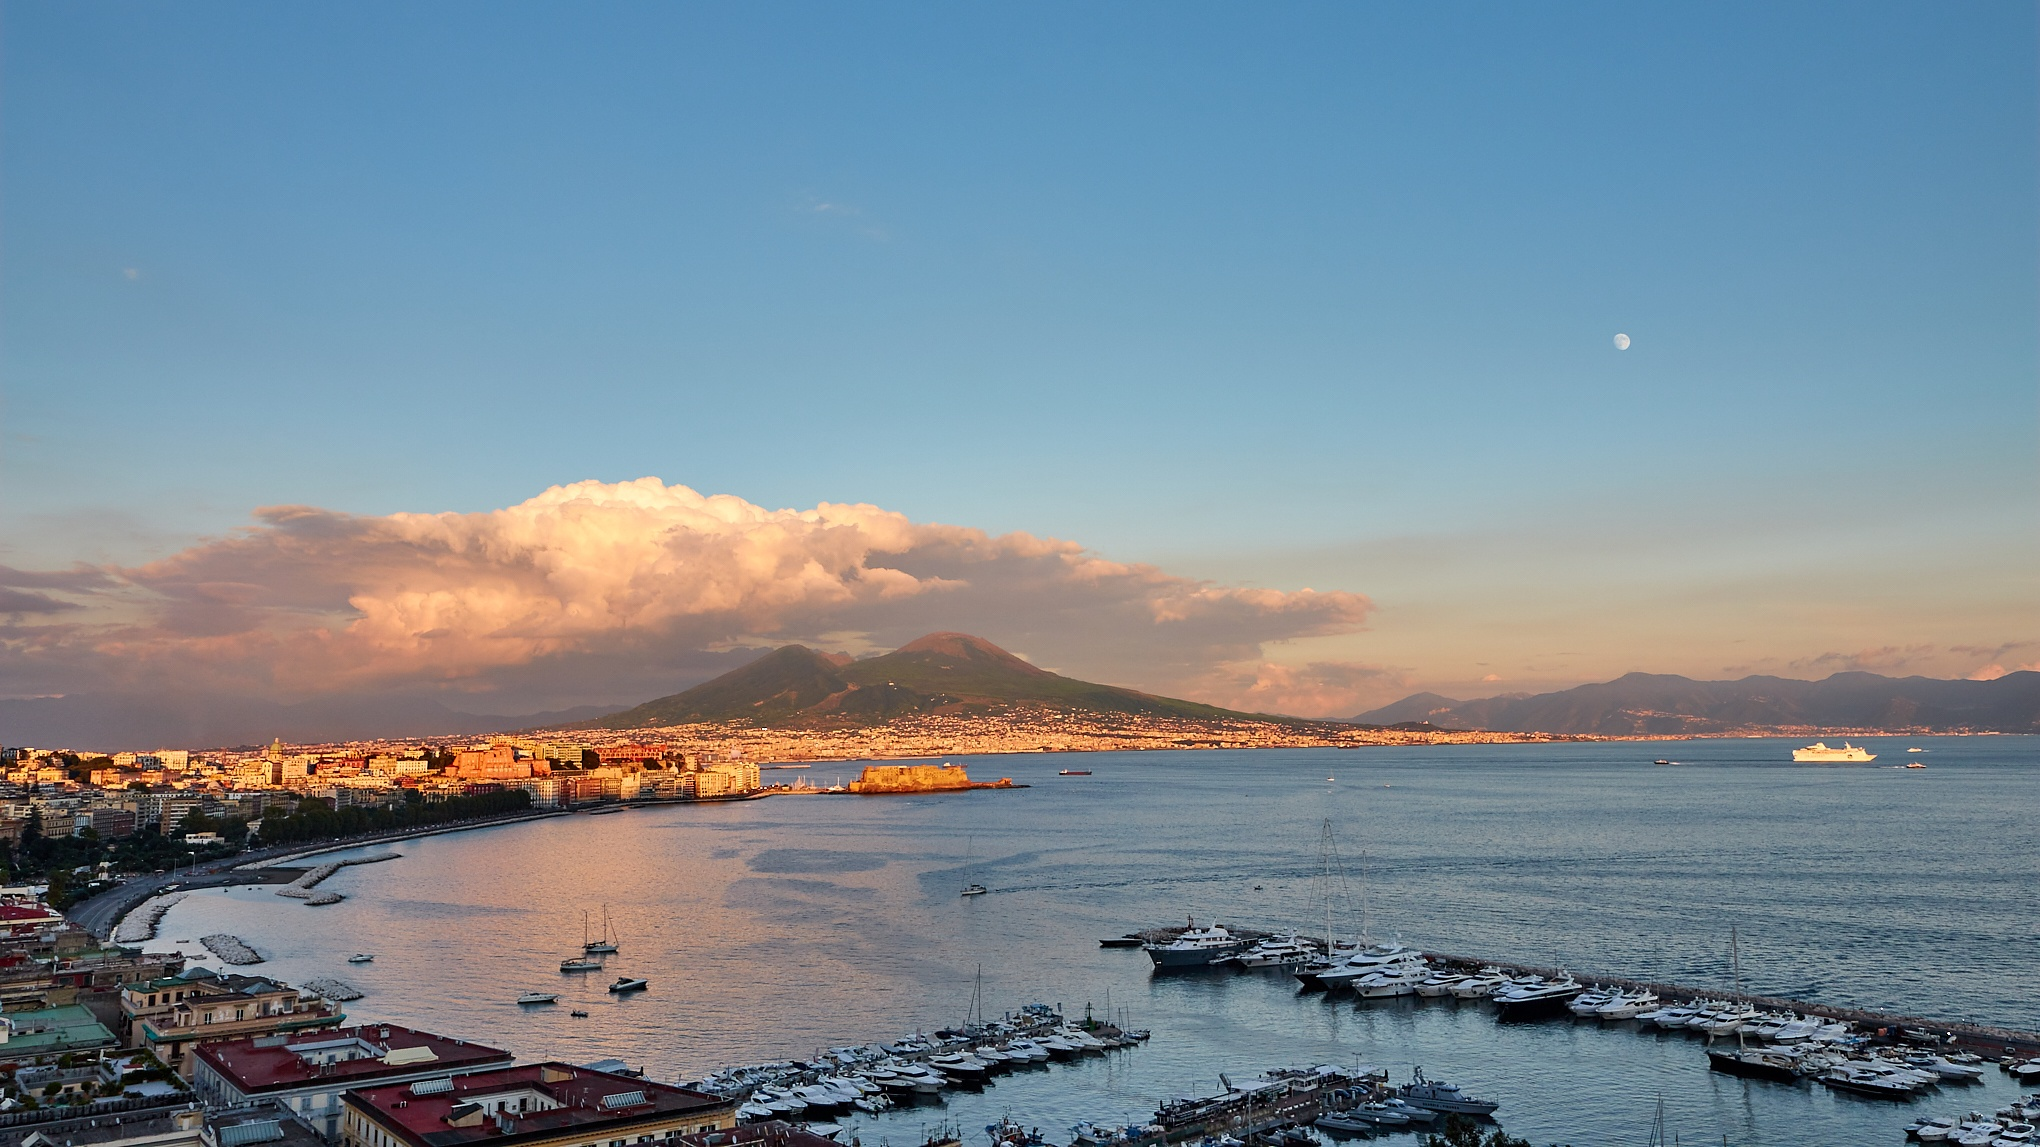 Napoli al tramonto by Gianni Russo